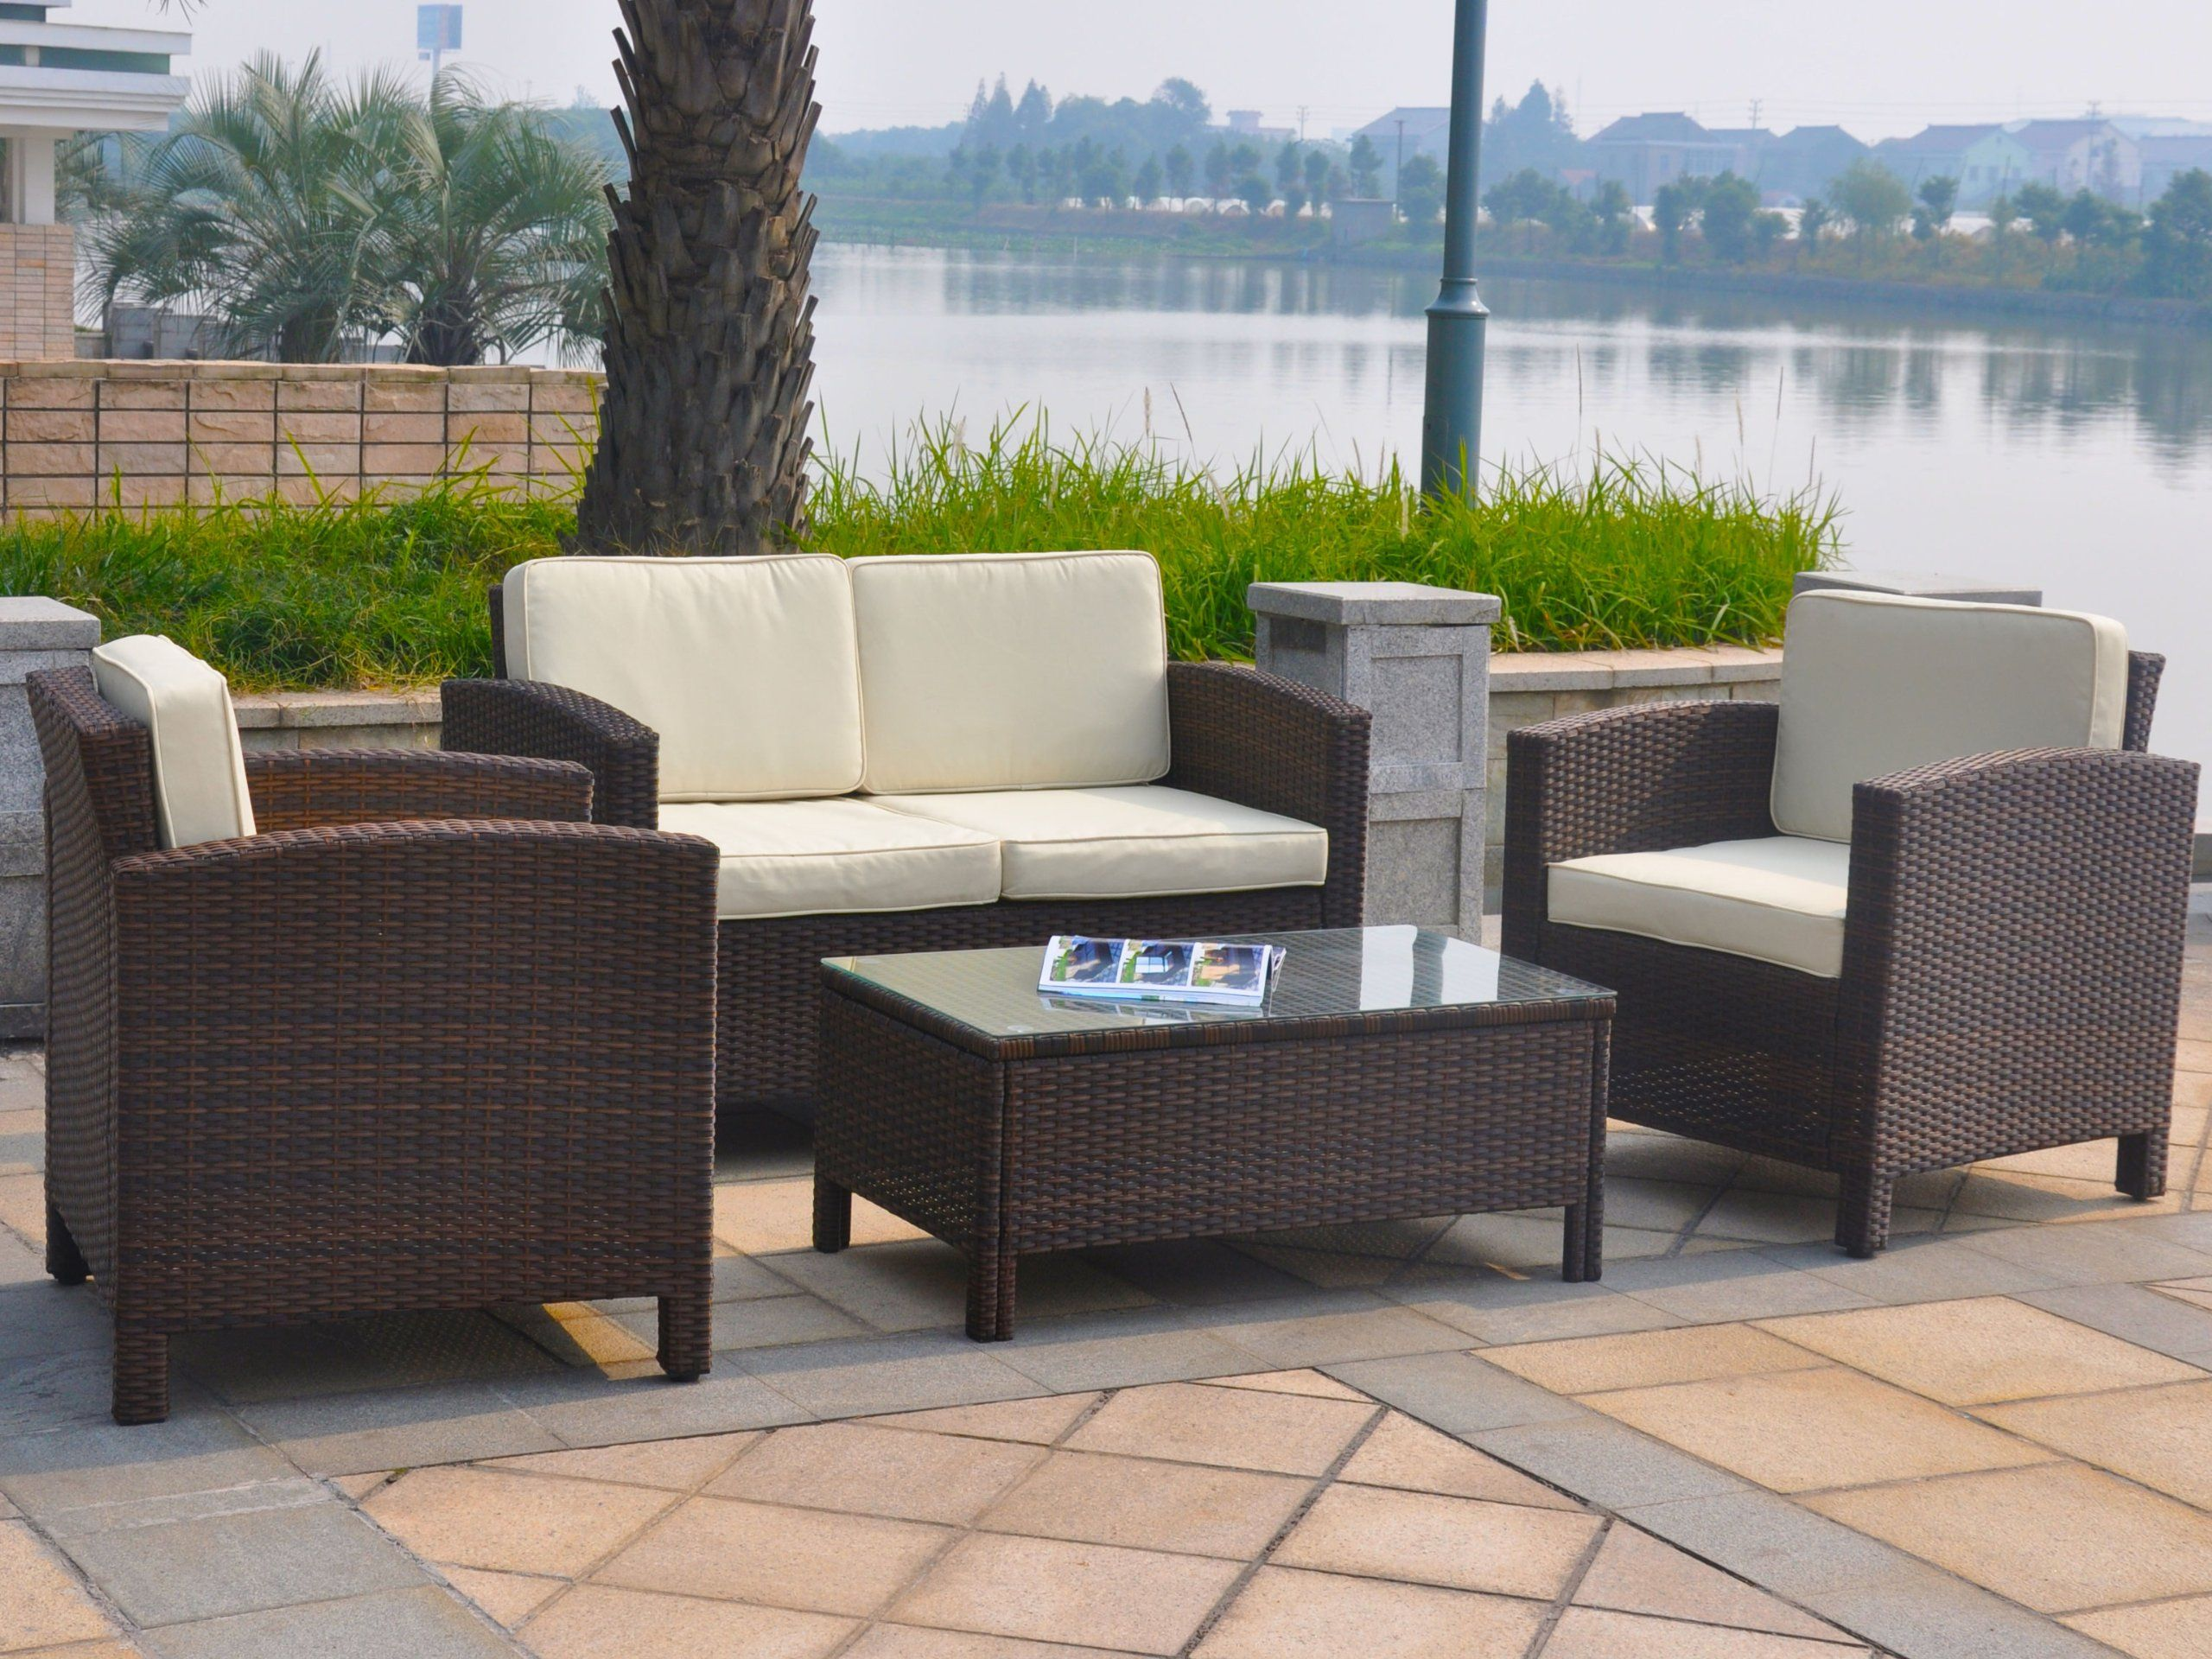 Amazon De 13tlg Deluxe Lounge Set Gruppe Garnitur Gartenmobel Loungemobel Polyrattan Sitzgruppe Handgeflocht Gartenmobel Sets Terassenideen Terassenentwurf